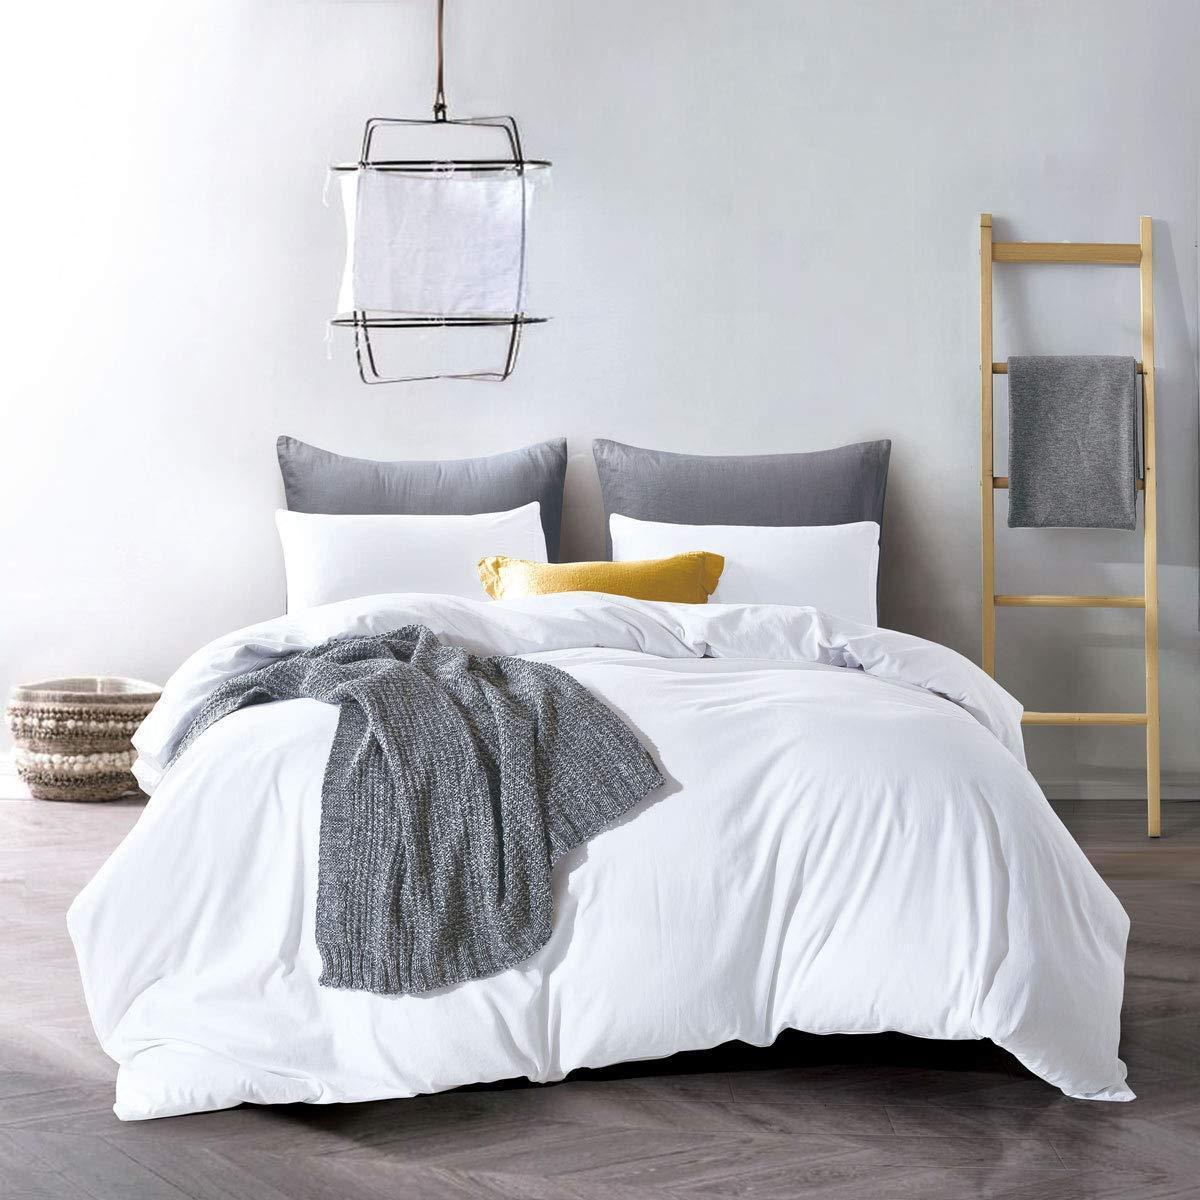 ATsense Duvet Cover Queen, 100% Washed Cotton, Bedding Duvet Cover Set, 3-Piece,